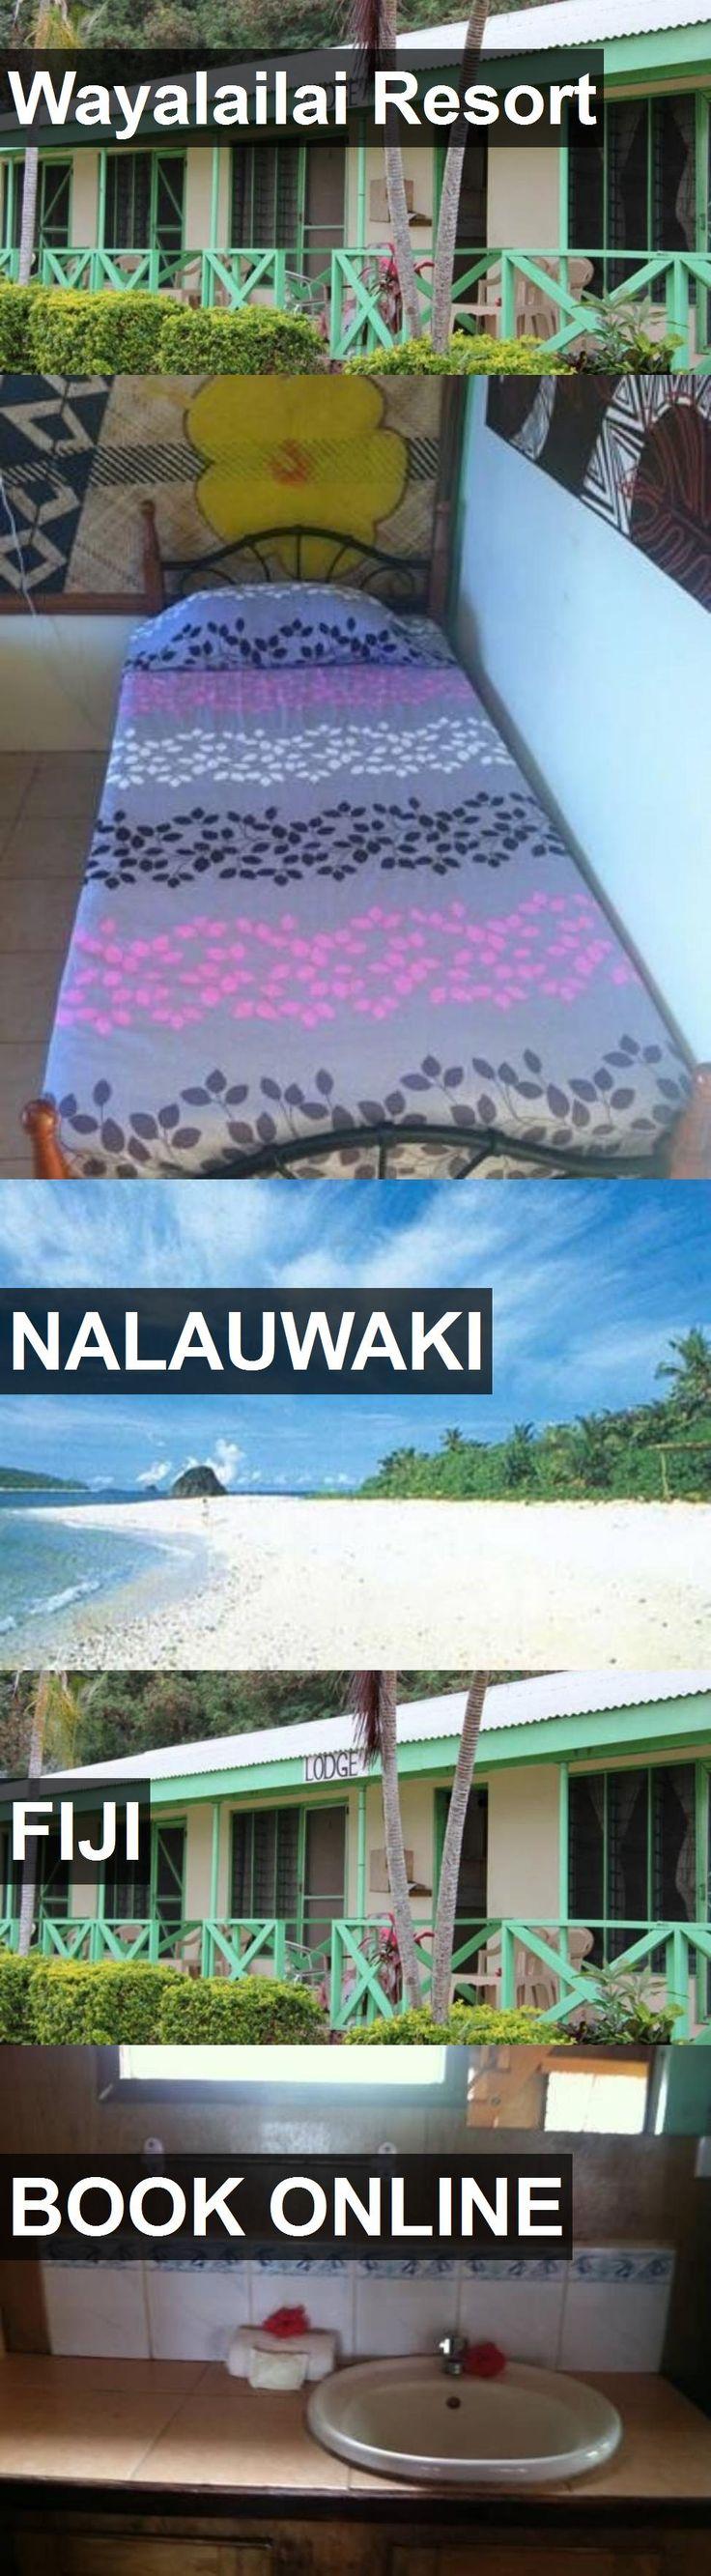 Hotel Wayalailai Resort in Nalauwaki, Fiji. For more information, photos, reviews and best prices please follow the link. #Fiji #Nalauwaki #travel #vacation #hotel